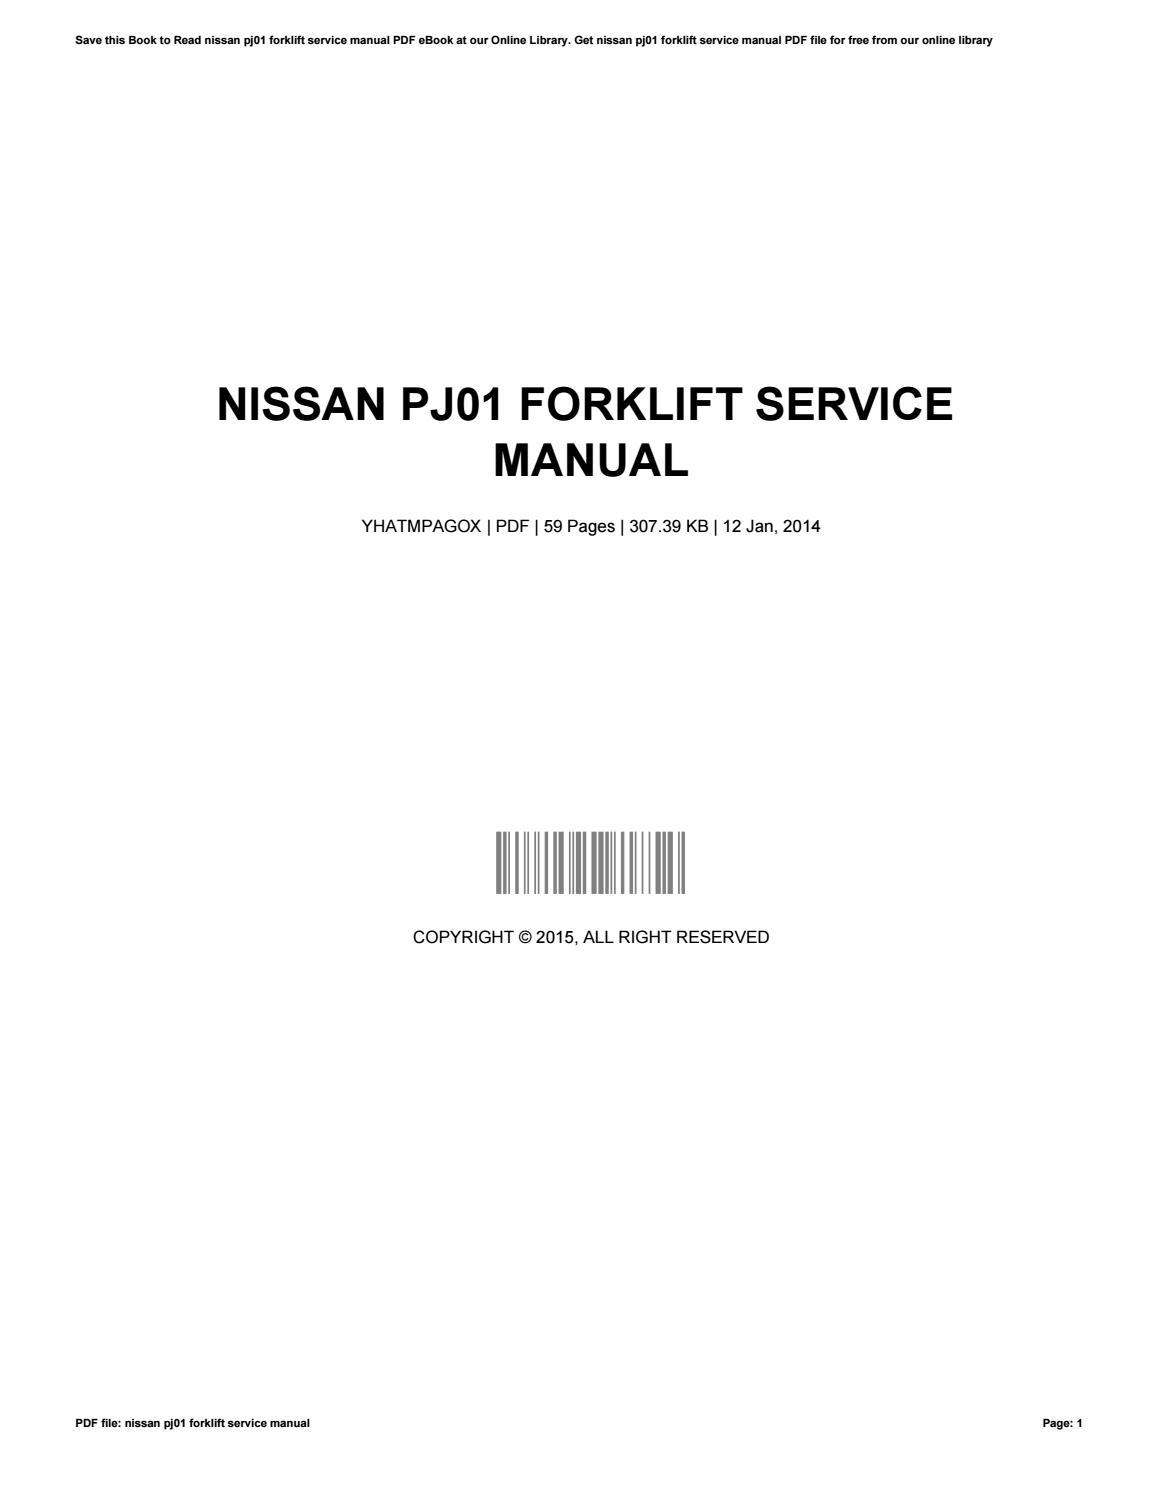 Nissan fork Lift service Manual